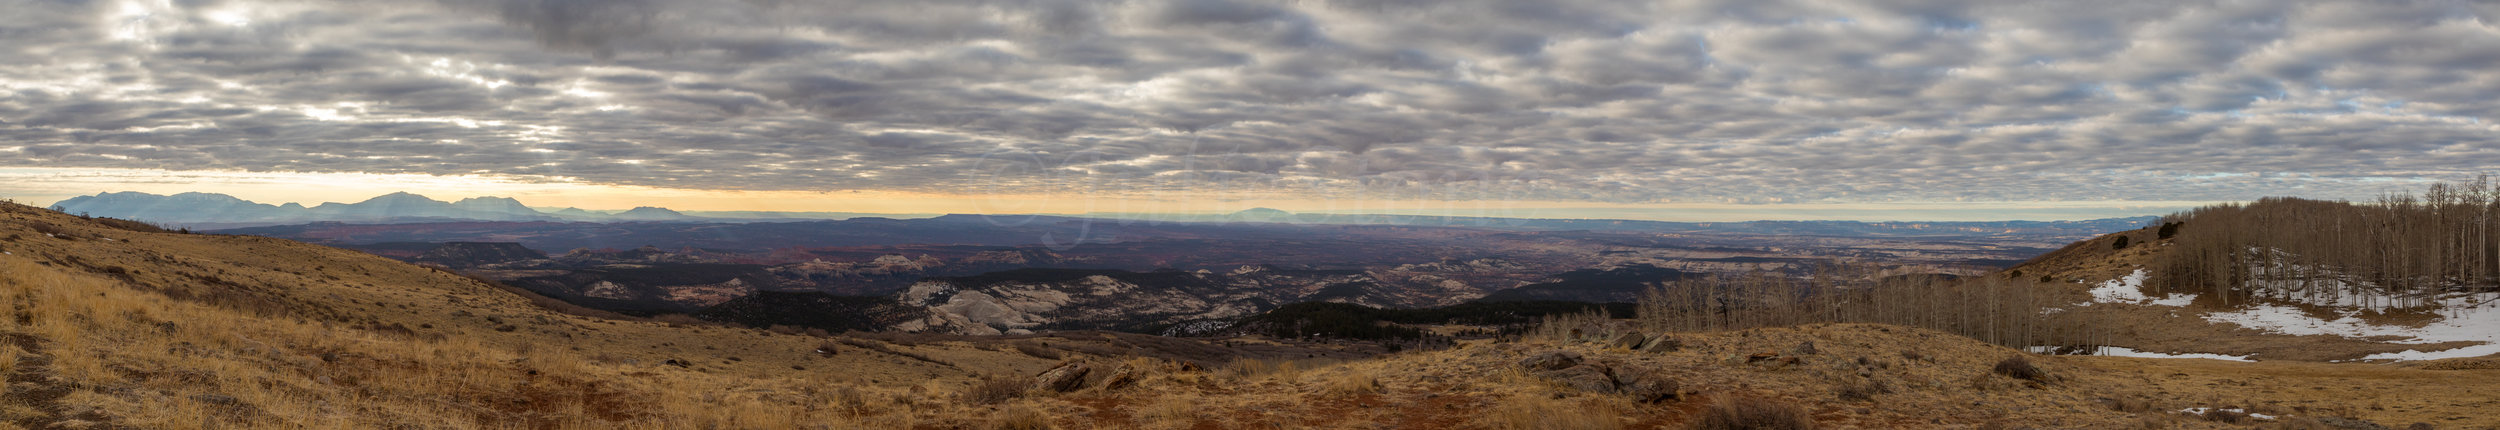 BOULDER MOUNTAIN PASS, IMAGE # 6718